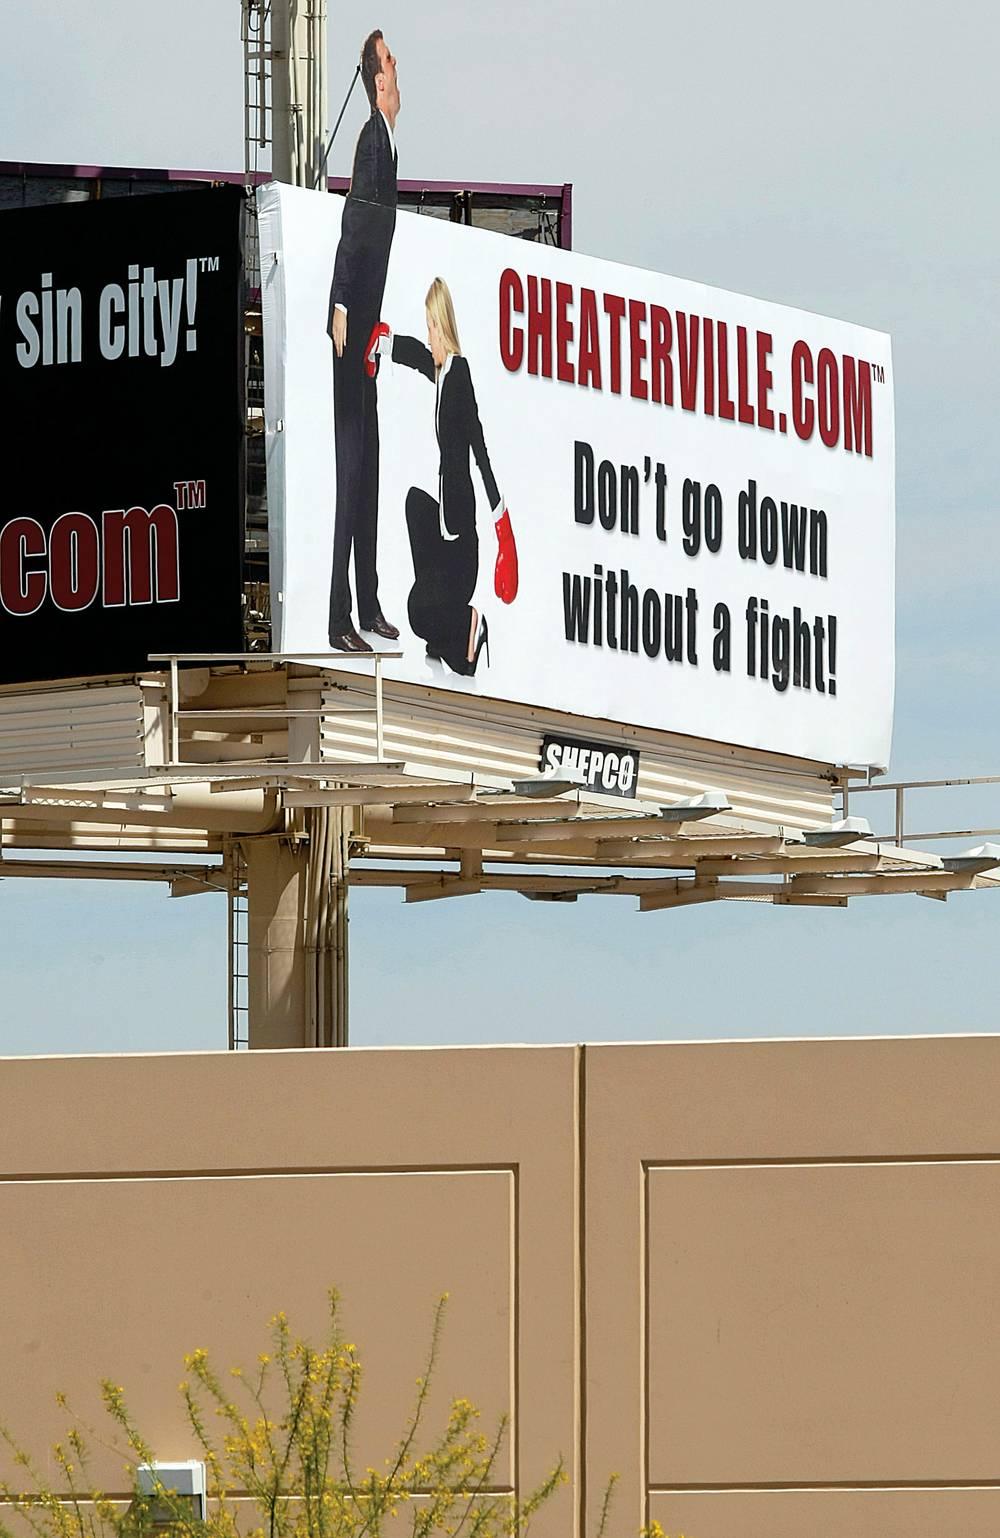 Cheaterville com